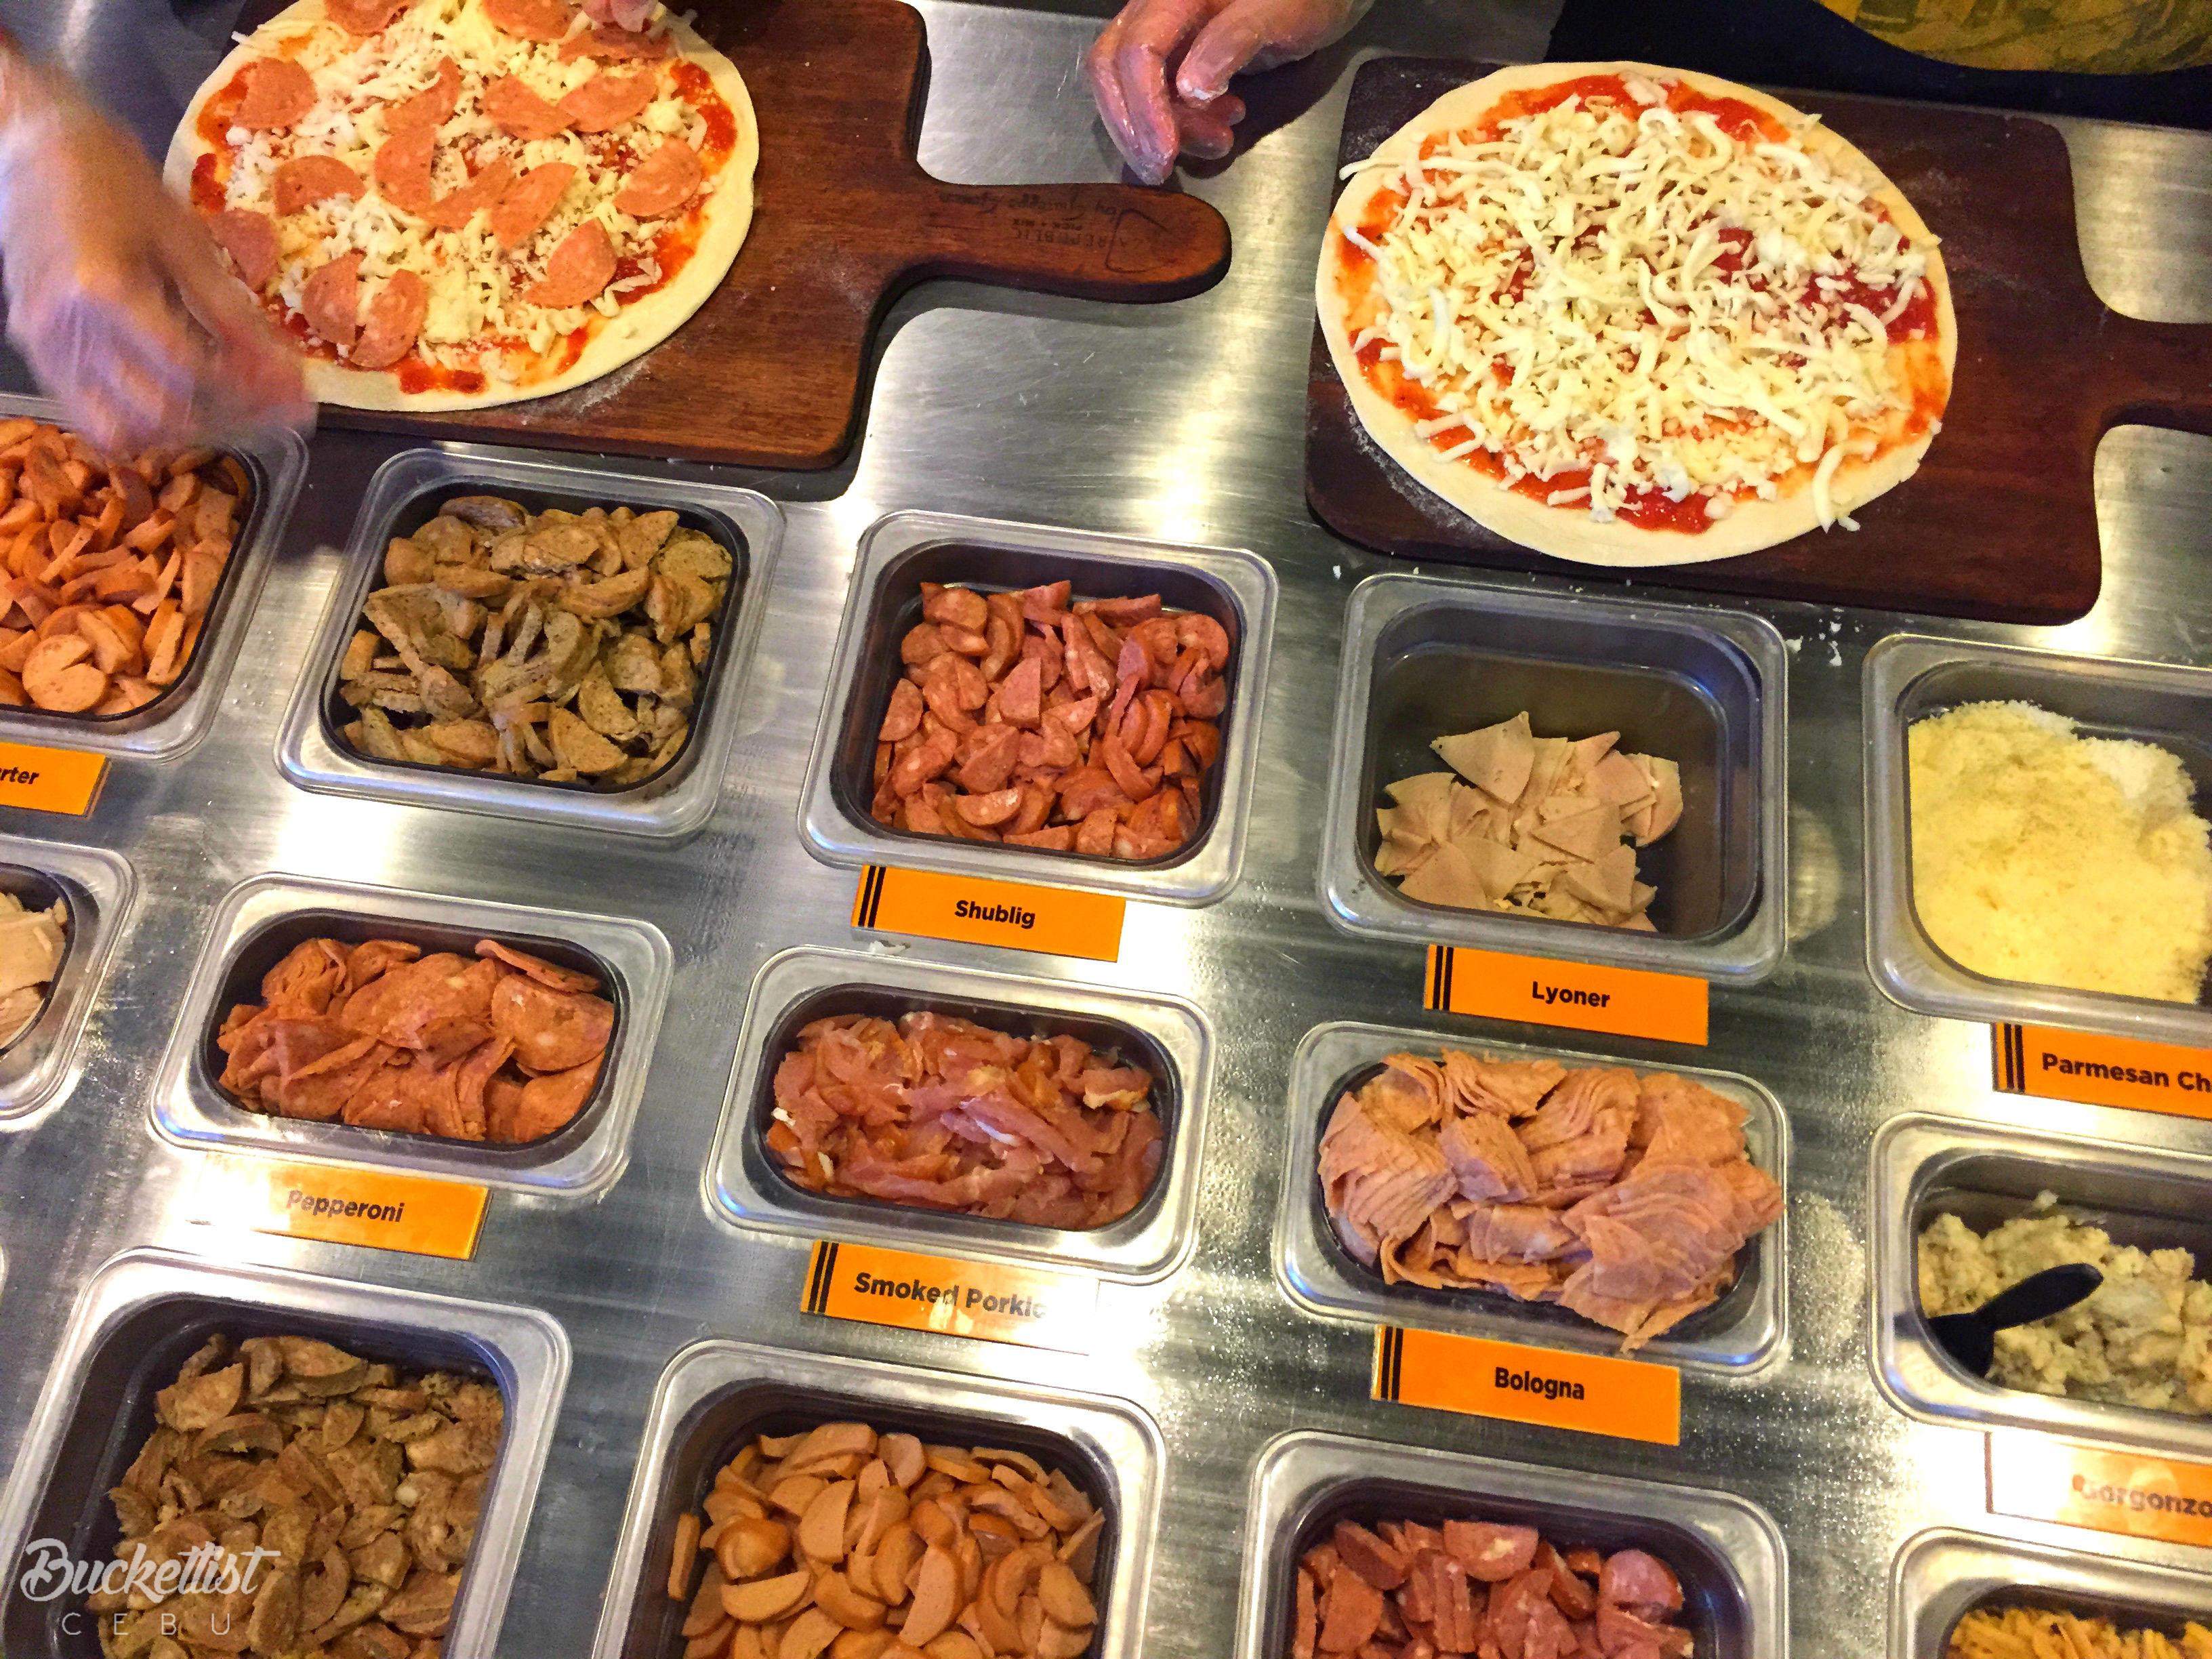 Make Your Own Pizza Bucketlist Cebu